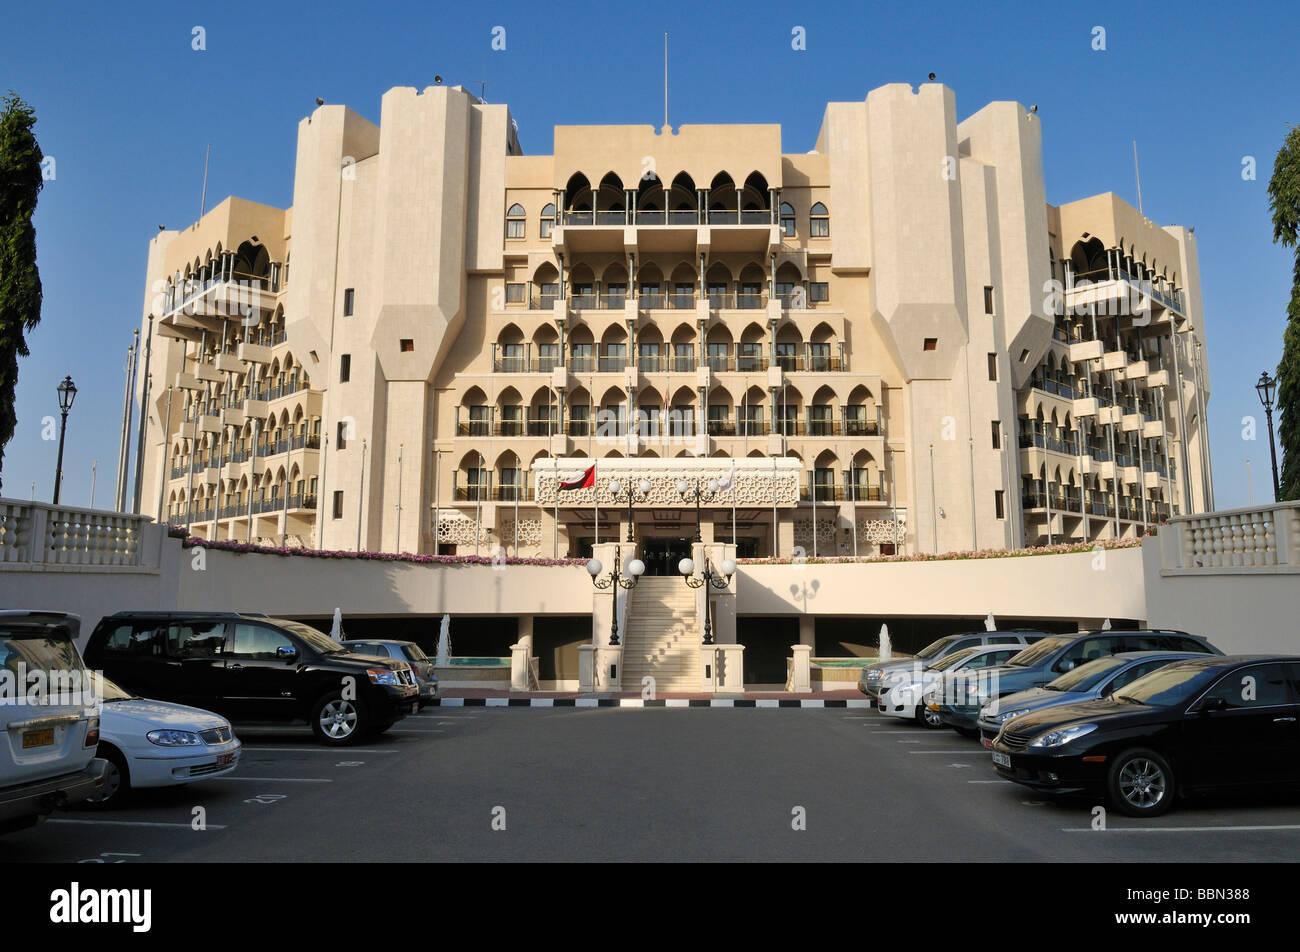 Five Star Hotel Al Bustan Palace Muscat Sultanate Of Oman Arabia Stock Photo Alamy